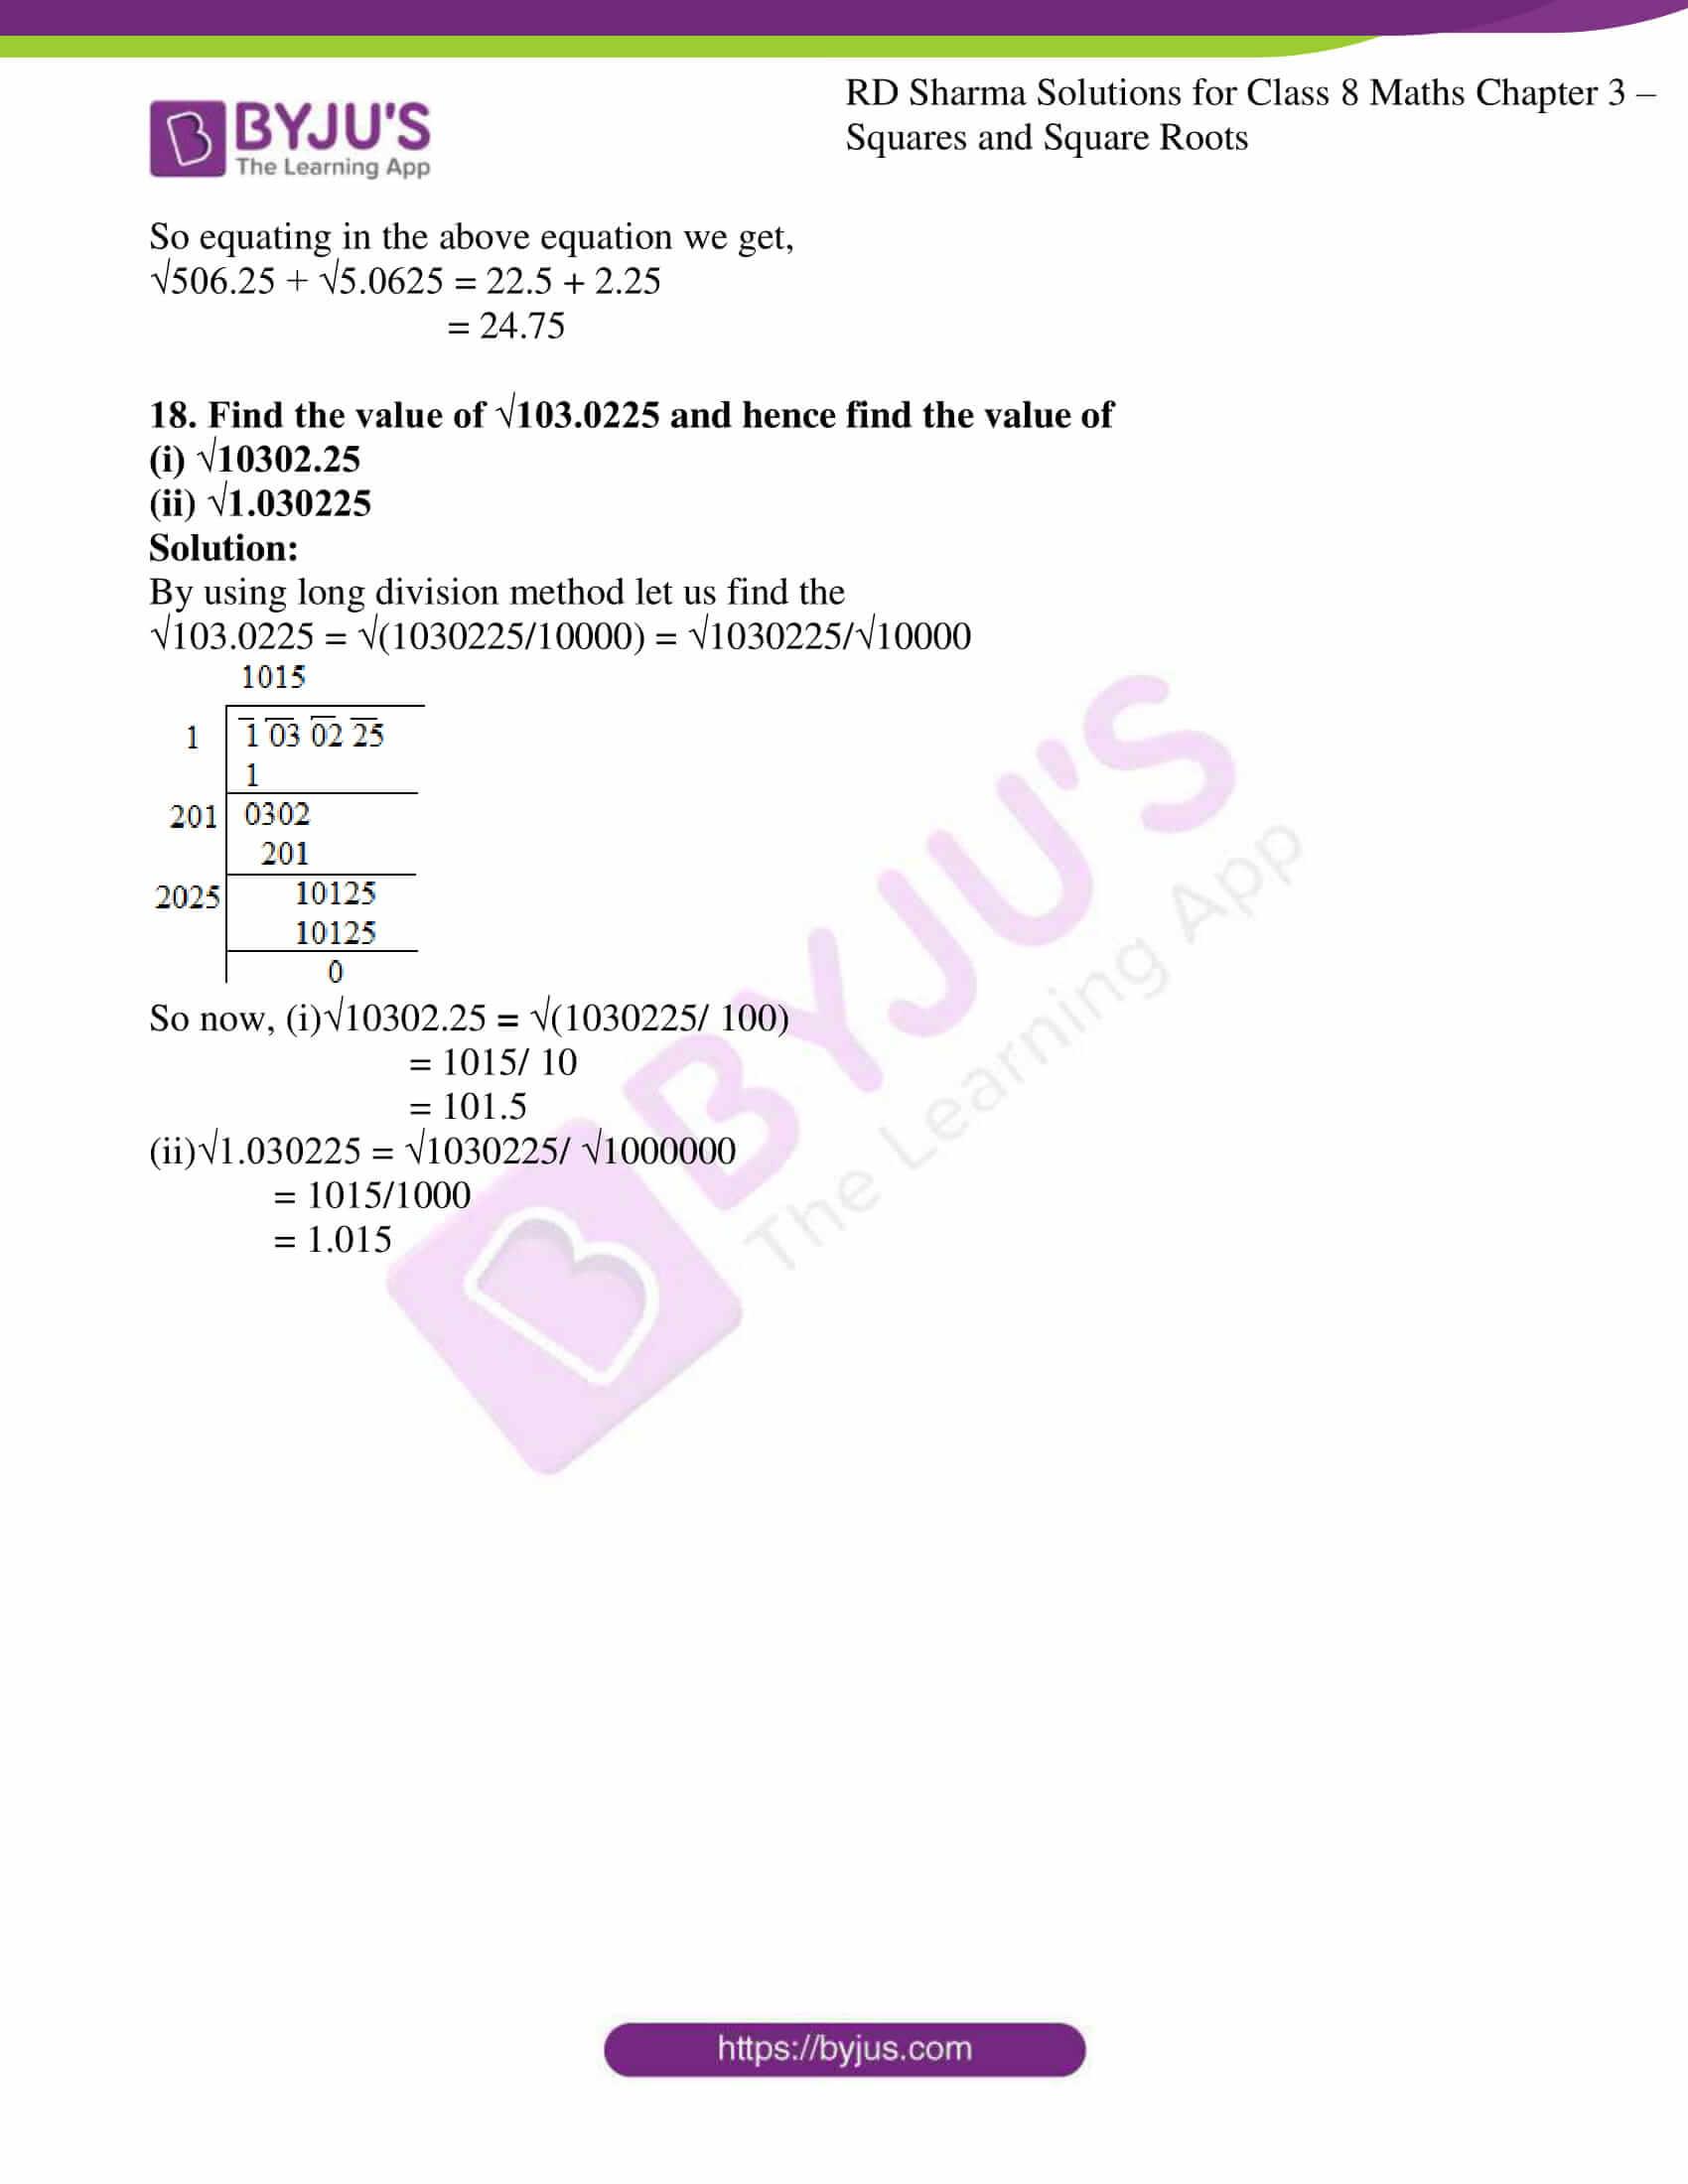 rd sharma class 8 maths chapter 3 exercise 7 9